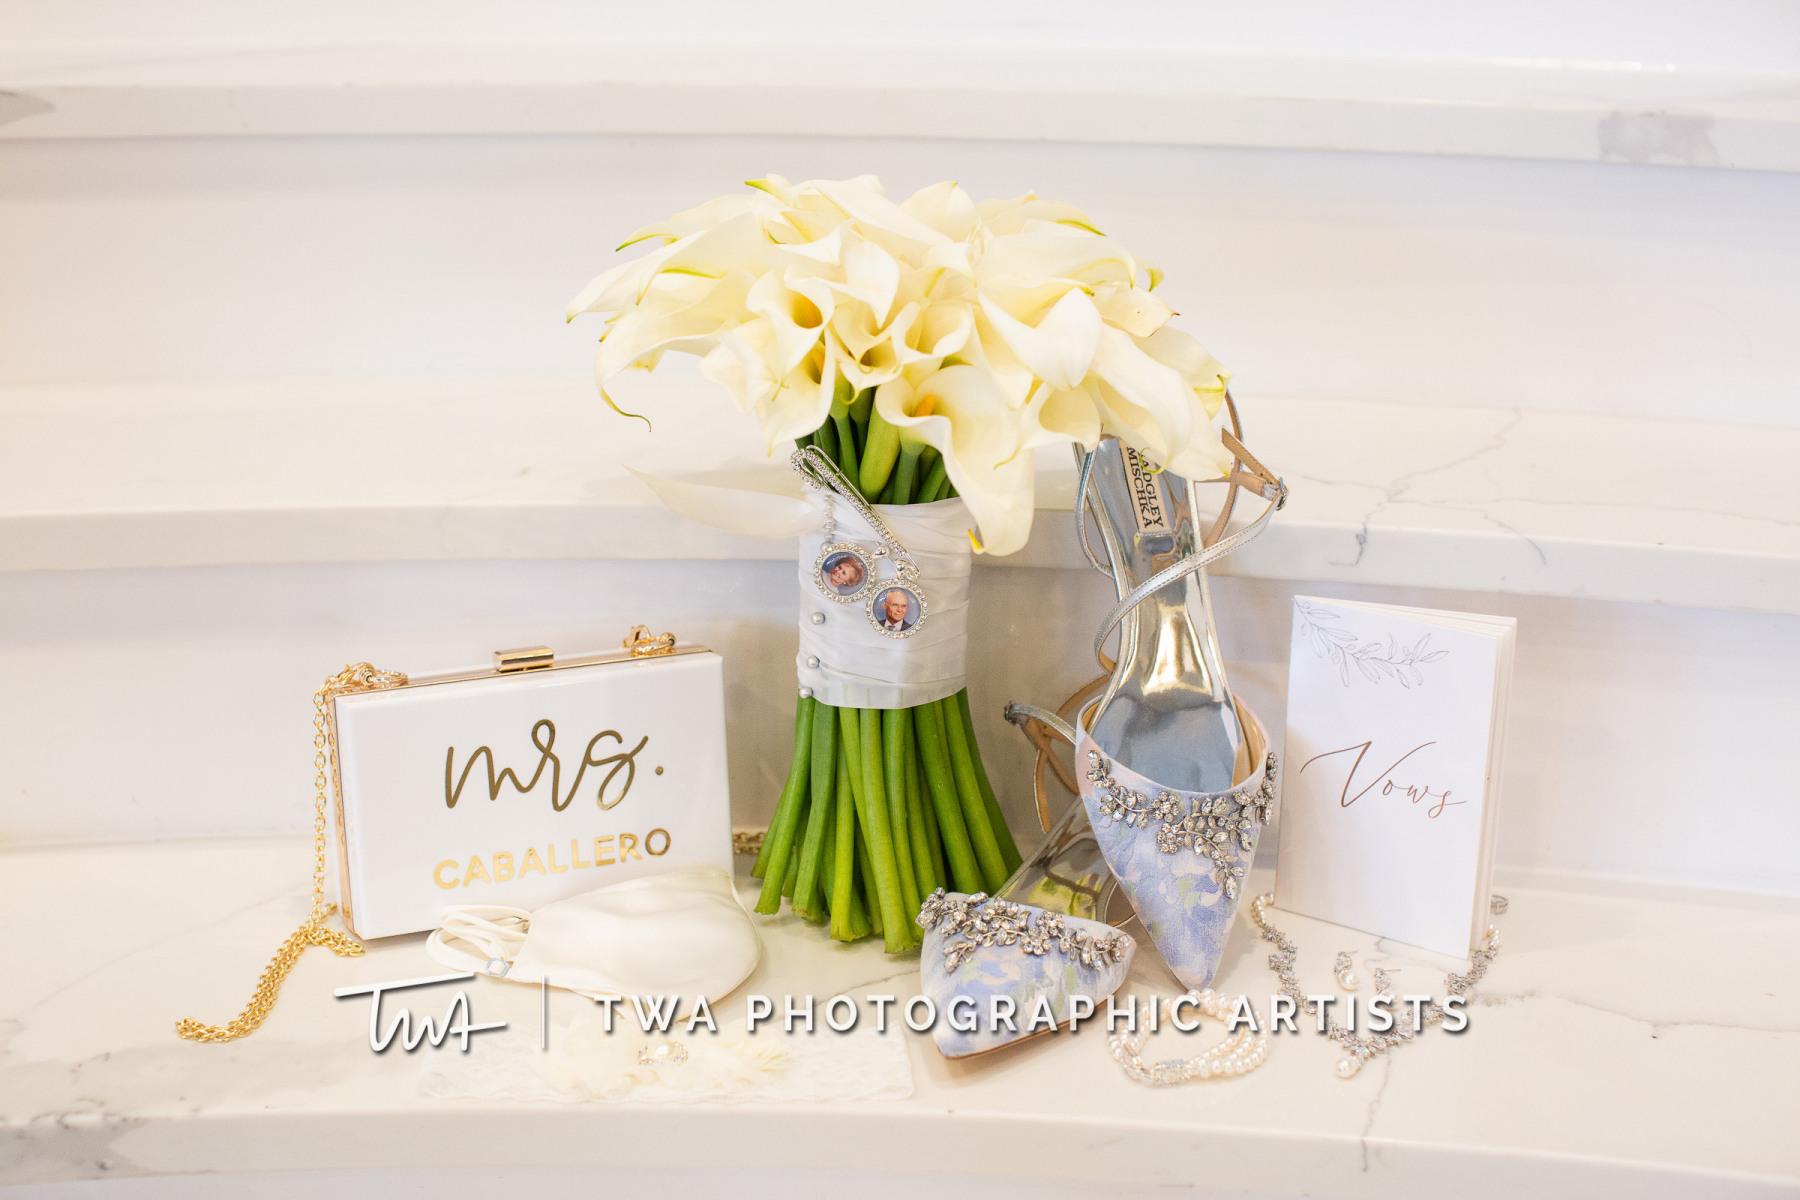 Chicago-Wedding-Photographers-Martini-Banquets_Borys_Caballero_MJ_SG-002-0030